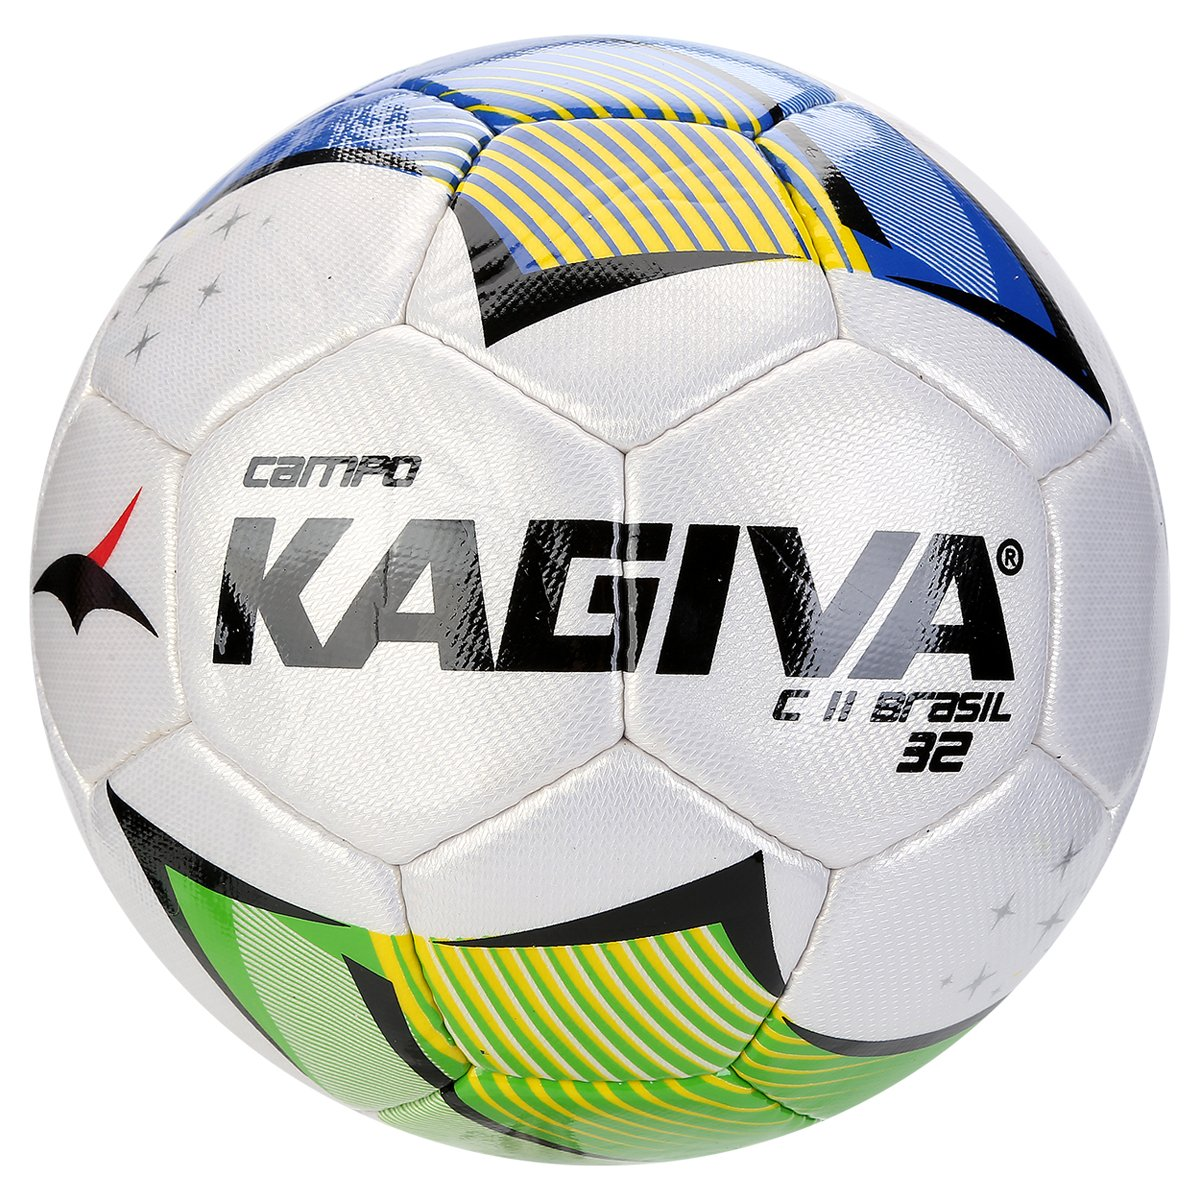 Bola Kagiva C11 Brasil 32 Campo - Compre Agora  99120a9b4f484